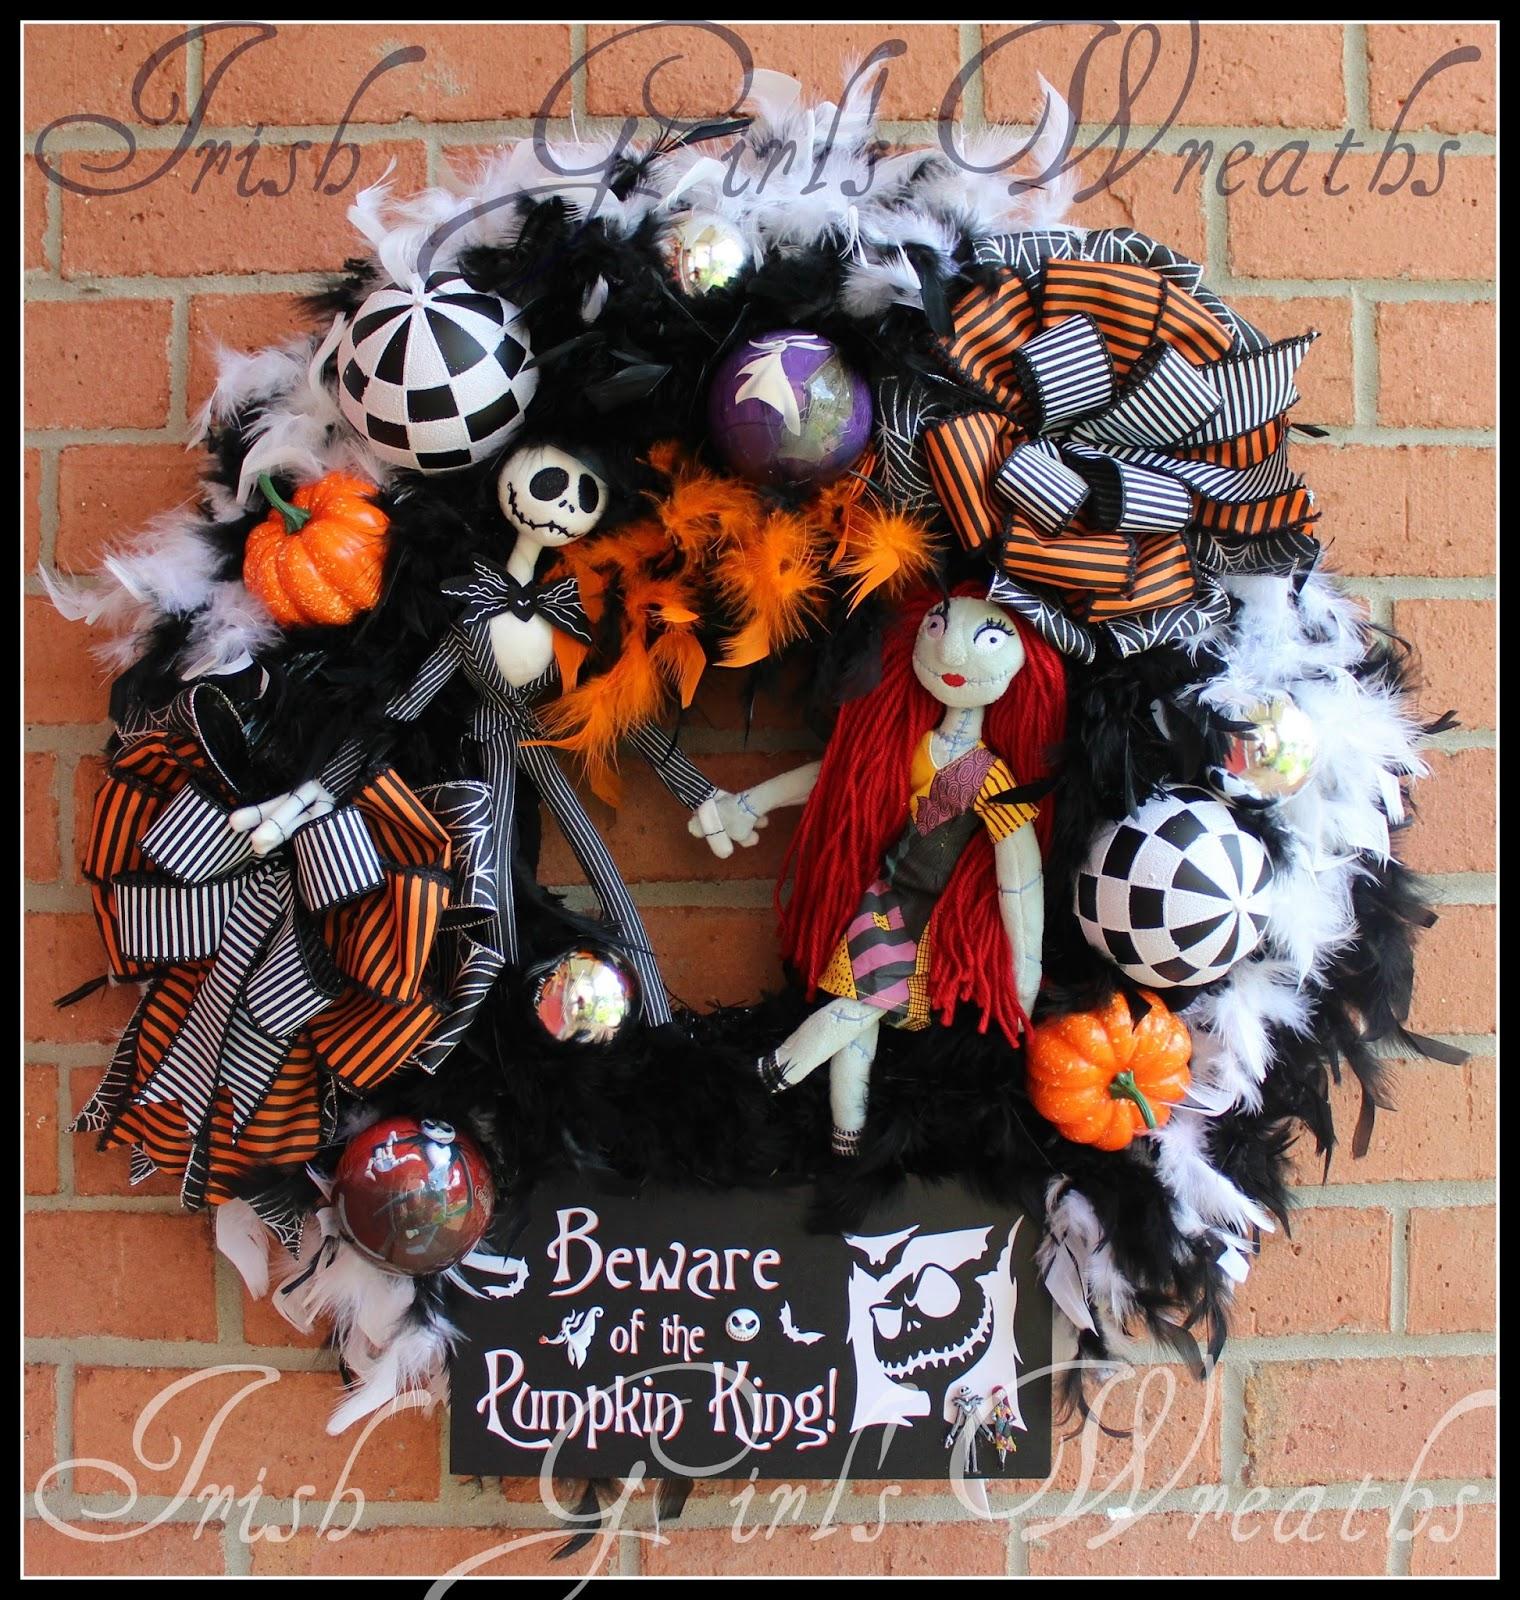 Pumpkin King Large Nightmare Halloween Wreath, Jack Skellington & Sally, Black, White, Boa, Zero, NBC, NBX, Xmas